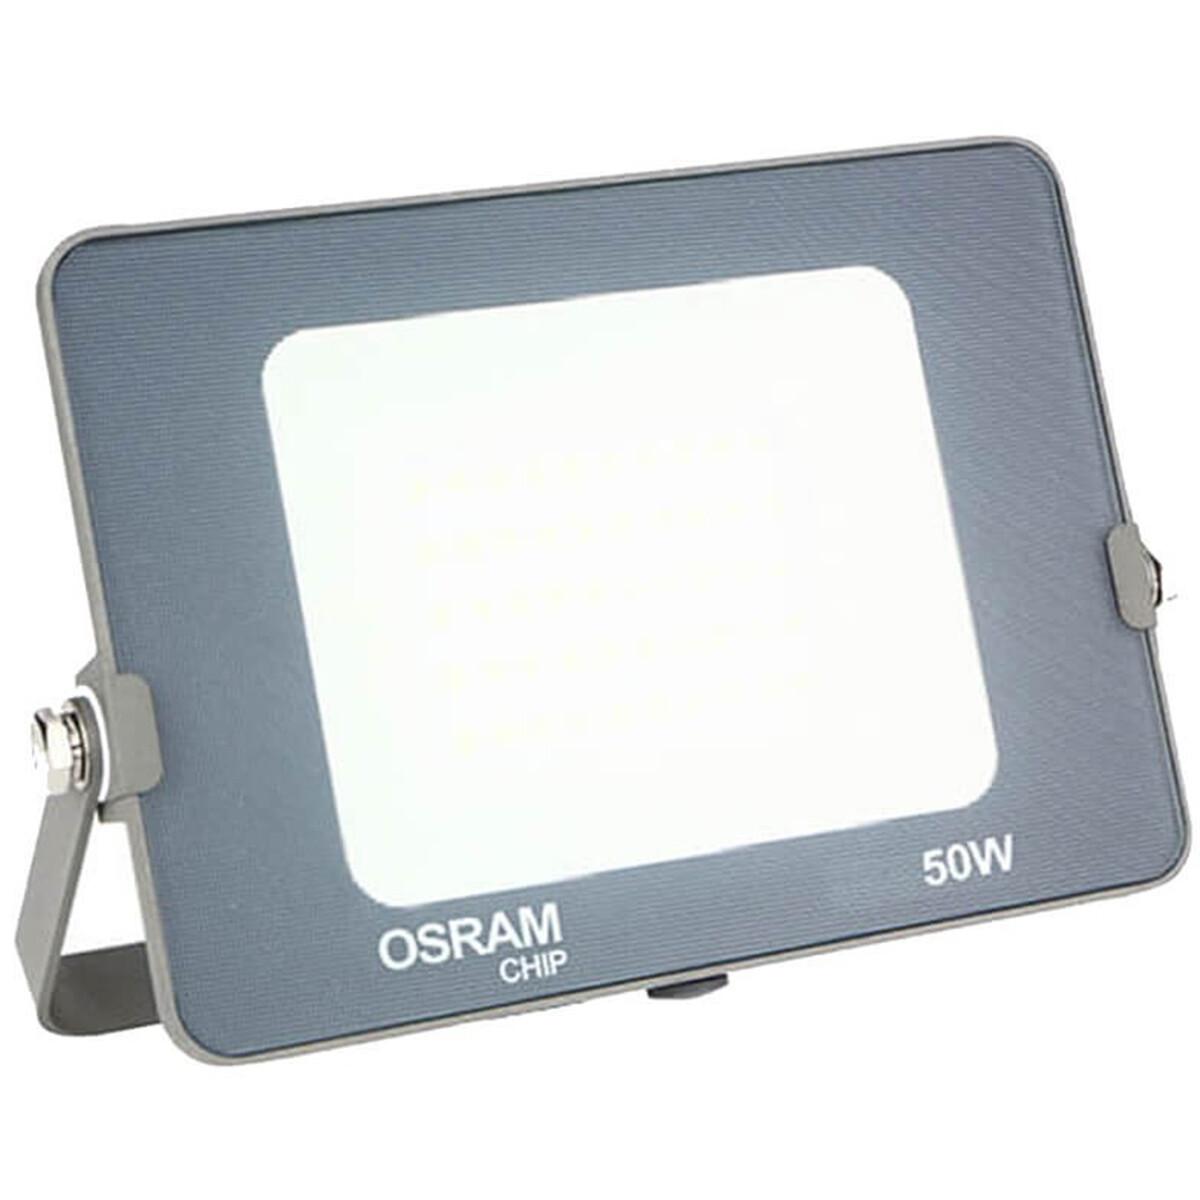 OSRAM - LED Bouwlamp 50 Watt - LED Schijnwerper - Warm Wit 3000K - Waterdicht IP65